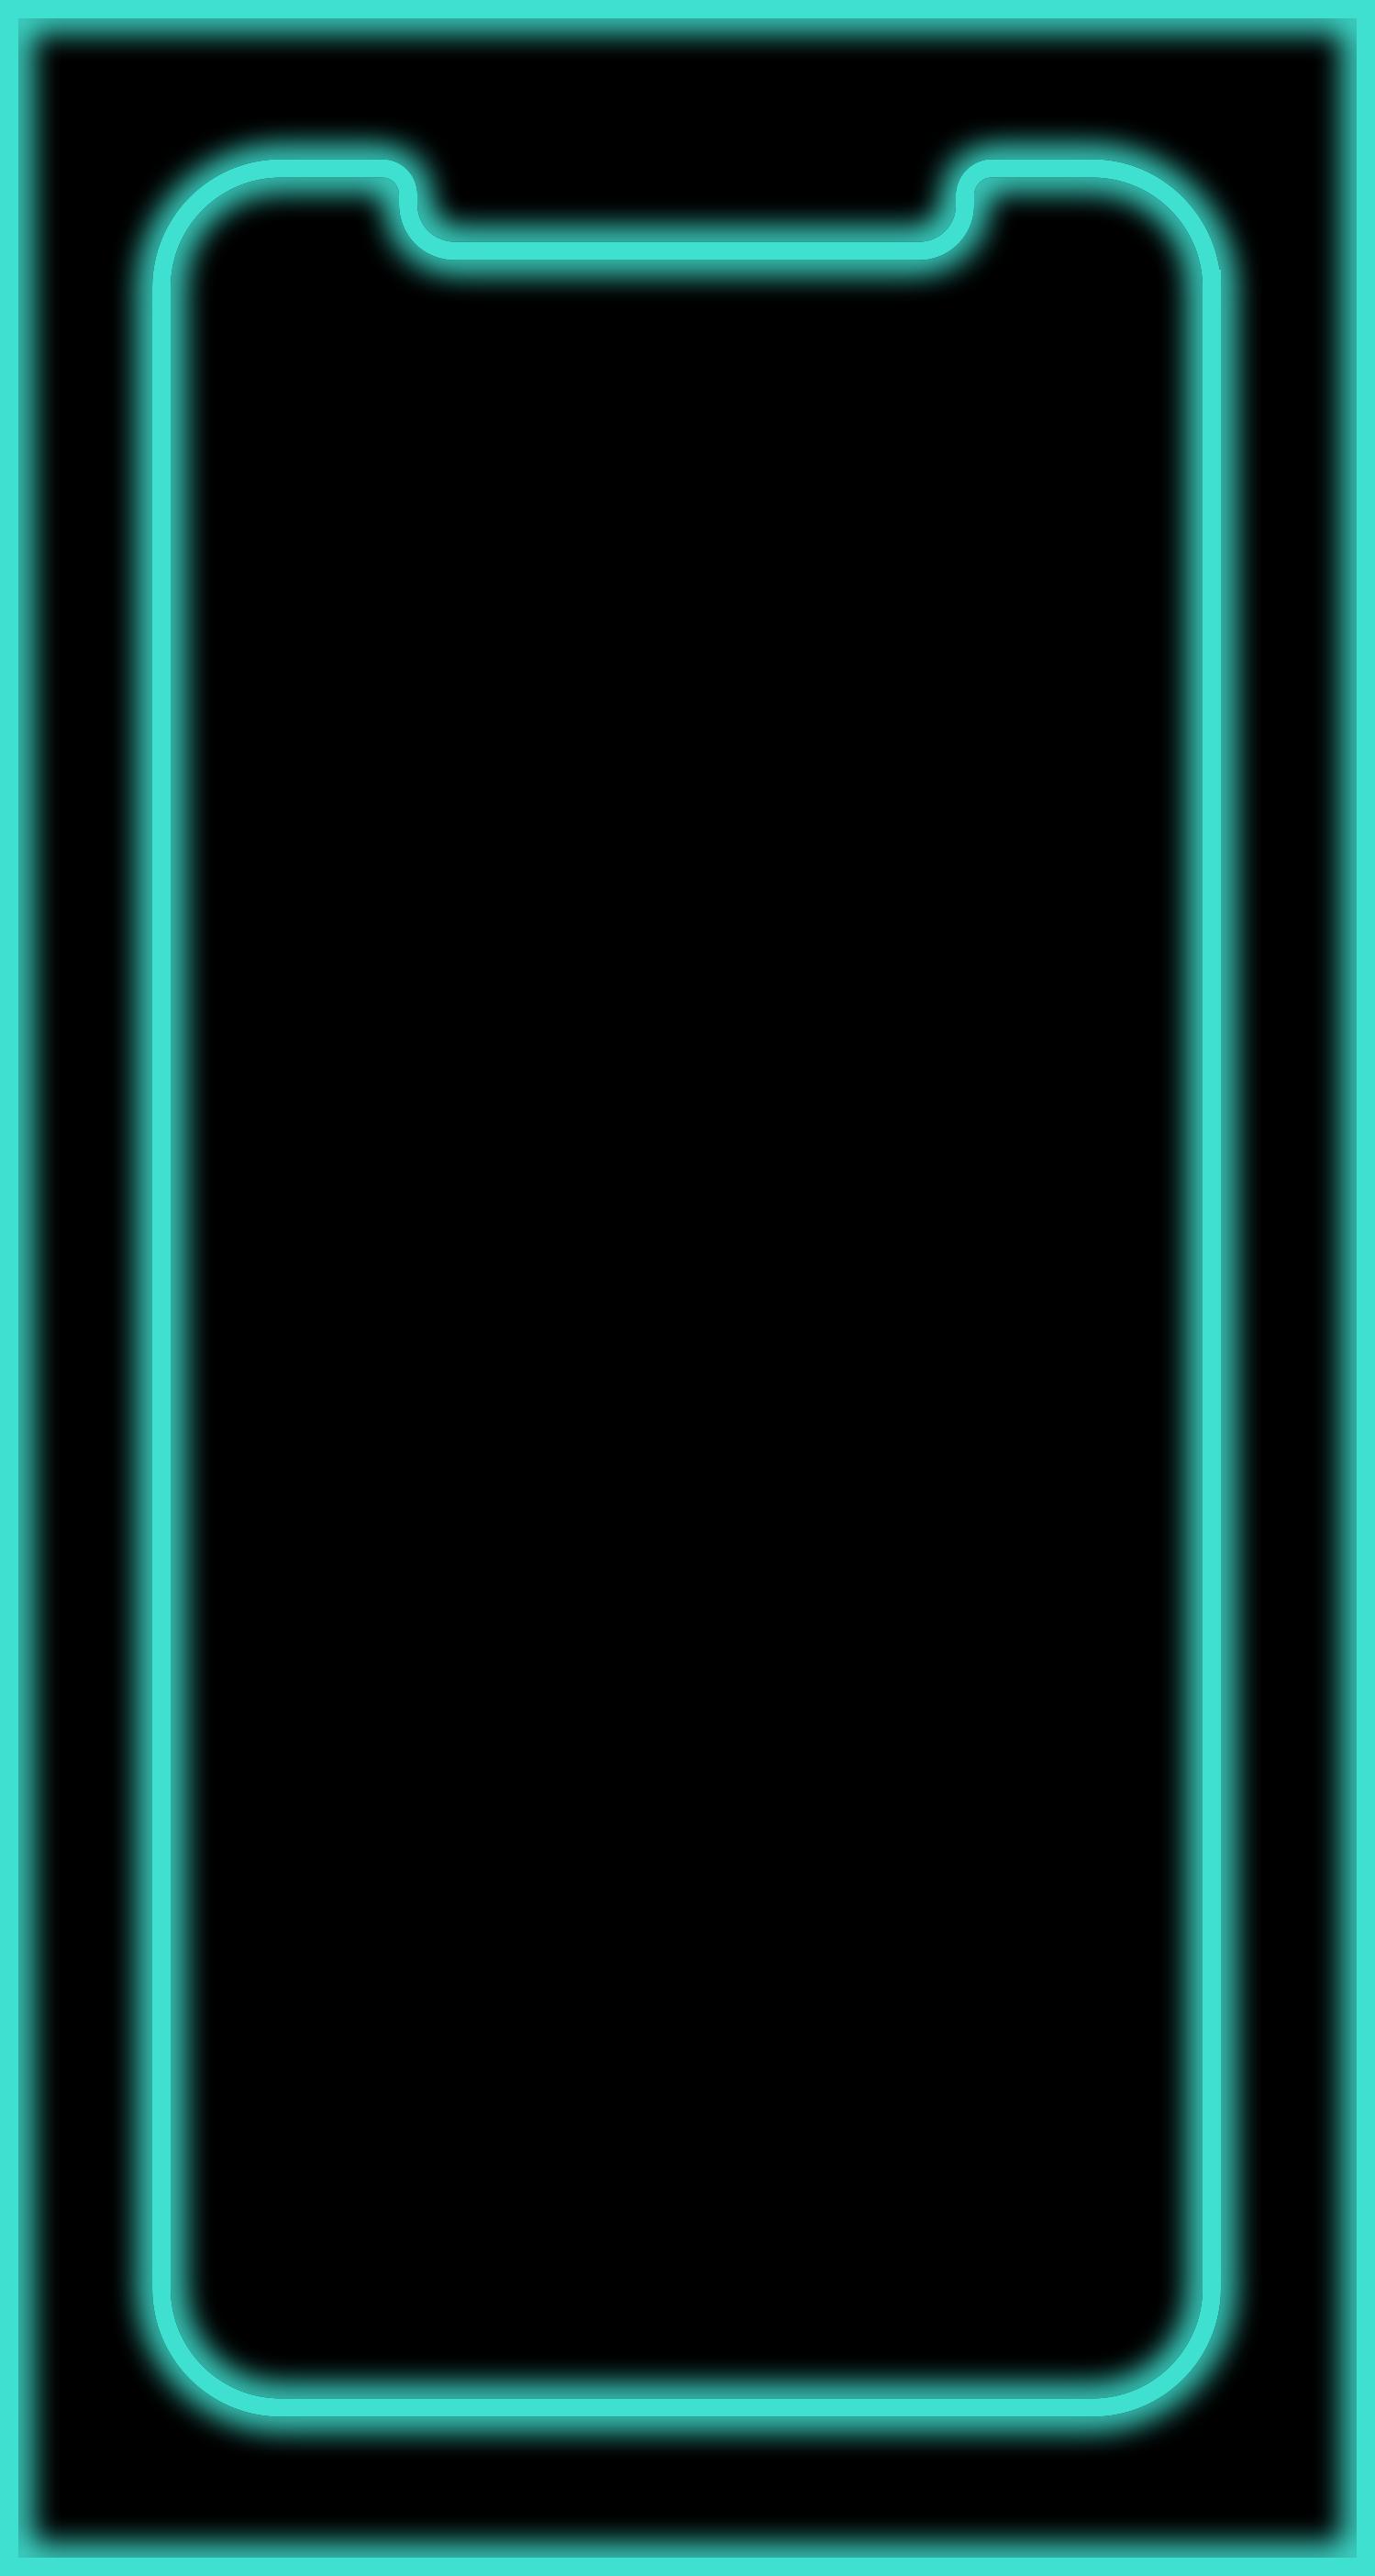 Iphone X Wallpaper Request Thread Macrumors Forums